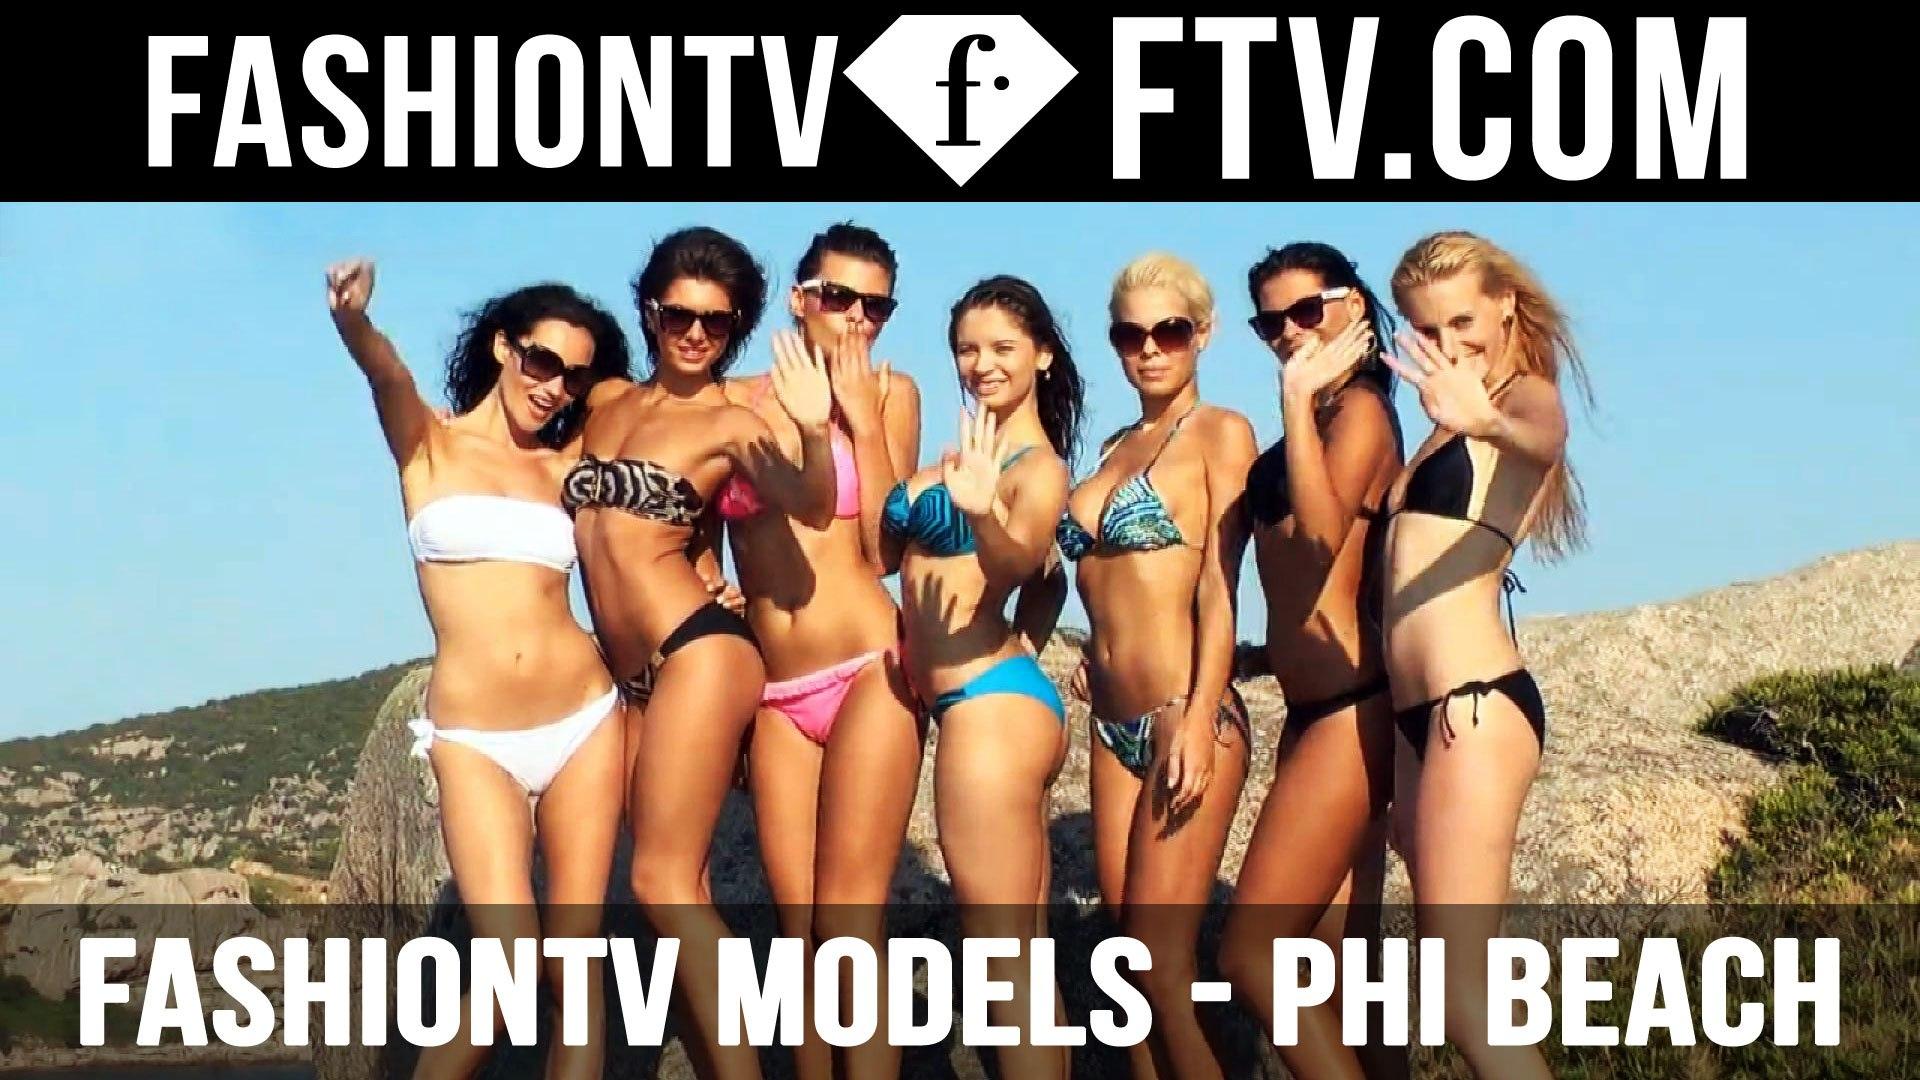 With Sexy Beach Fashiontv Summer Bikini Photoshoot 2011Sardinia On Phi Models EY29HWDI